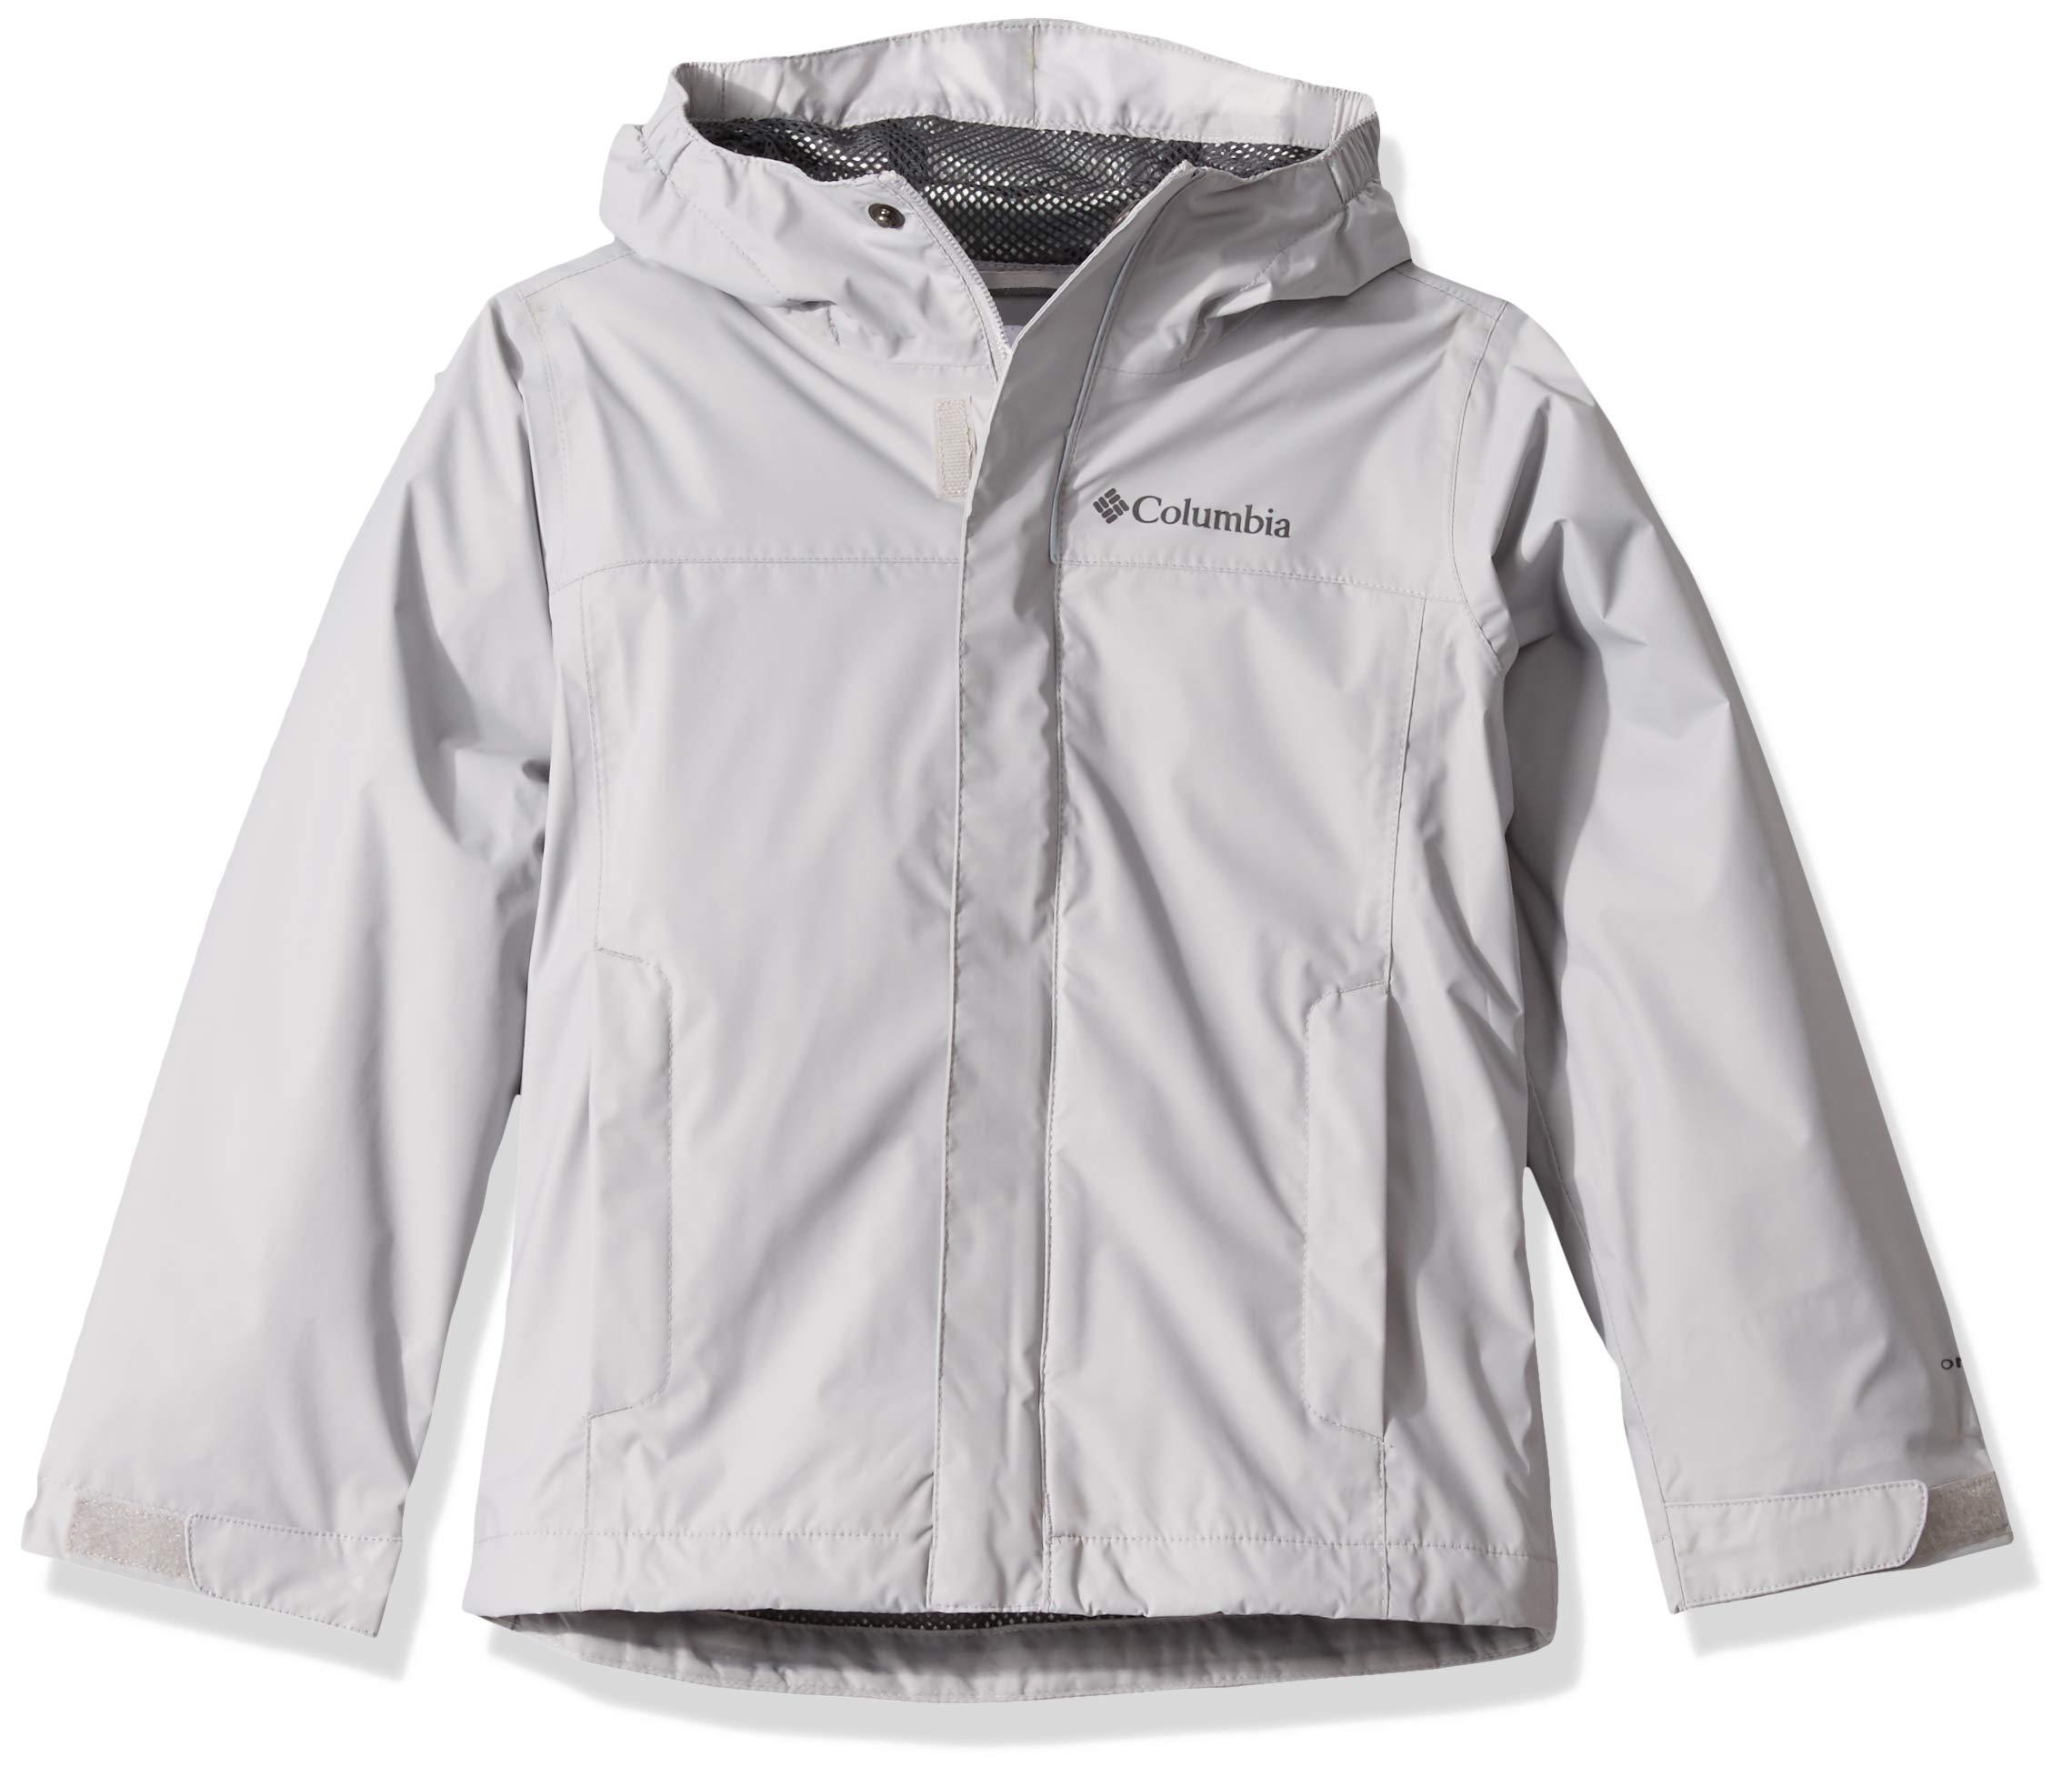 Columbia Boys' Big Watertight Jacket, Waterproof and Breathable, Slate Grey, X-Small by Columbia